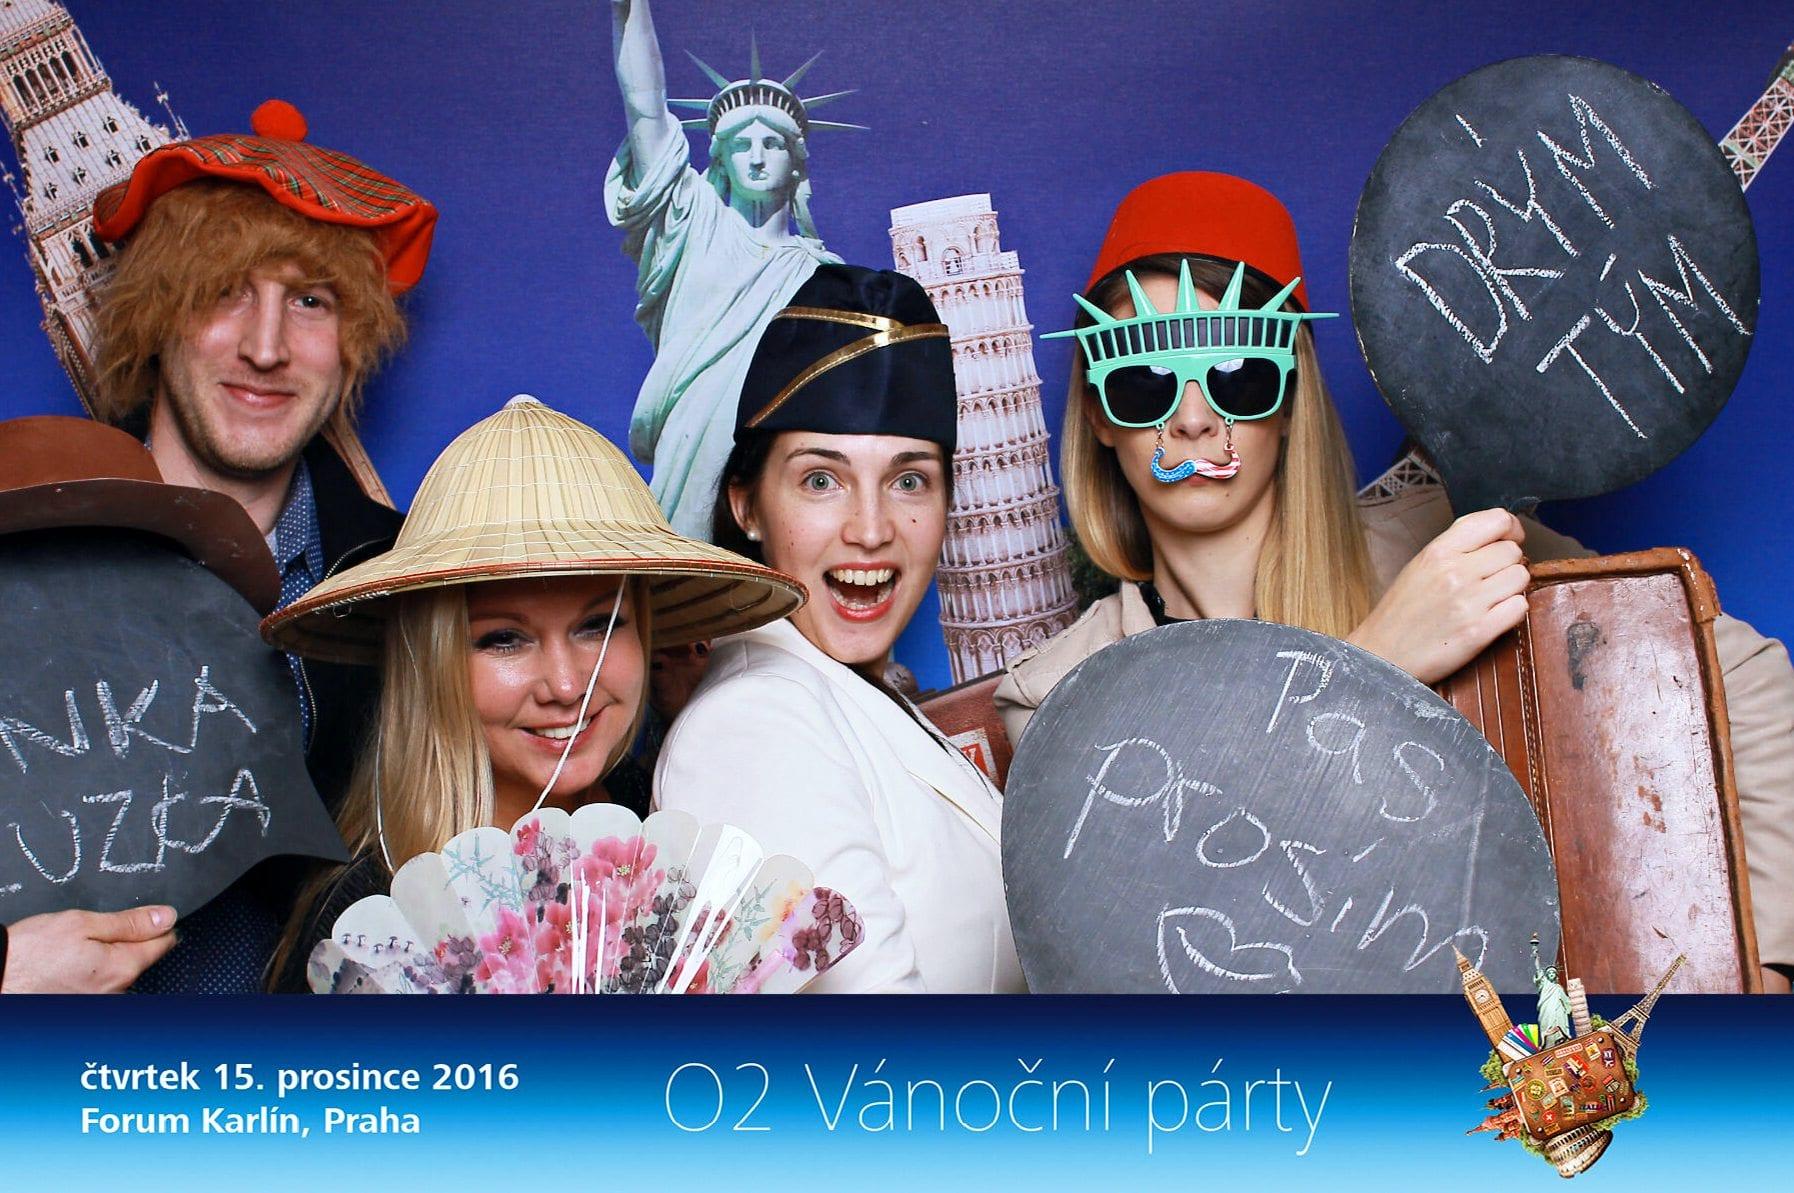 fotokoutek-02-vanocni-vecirek-cast-3-15-12-2016-189716